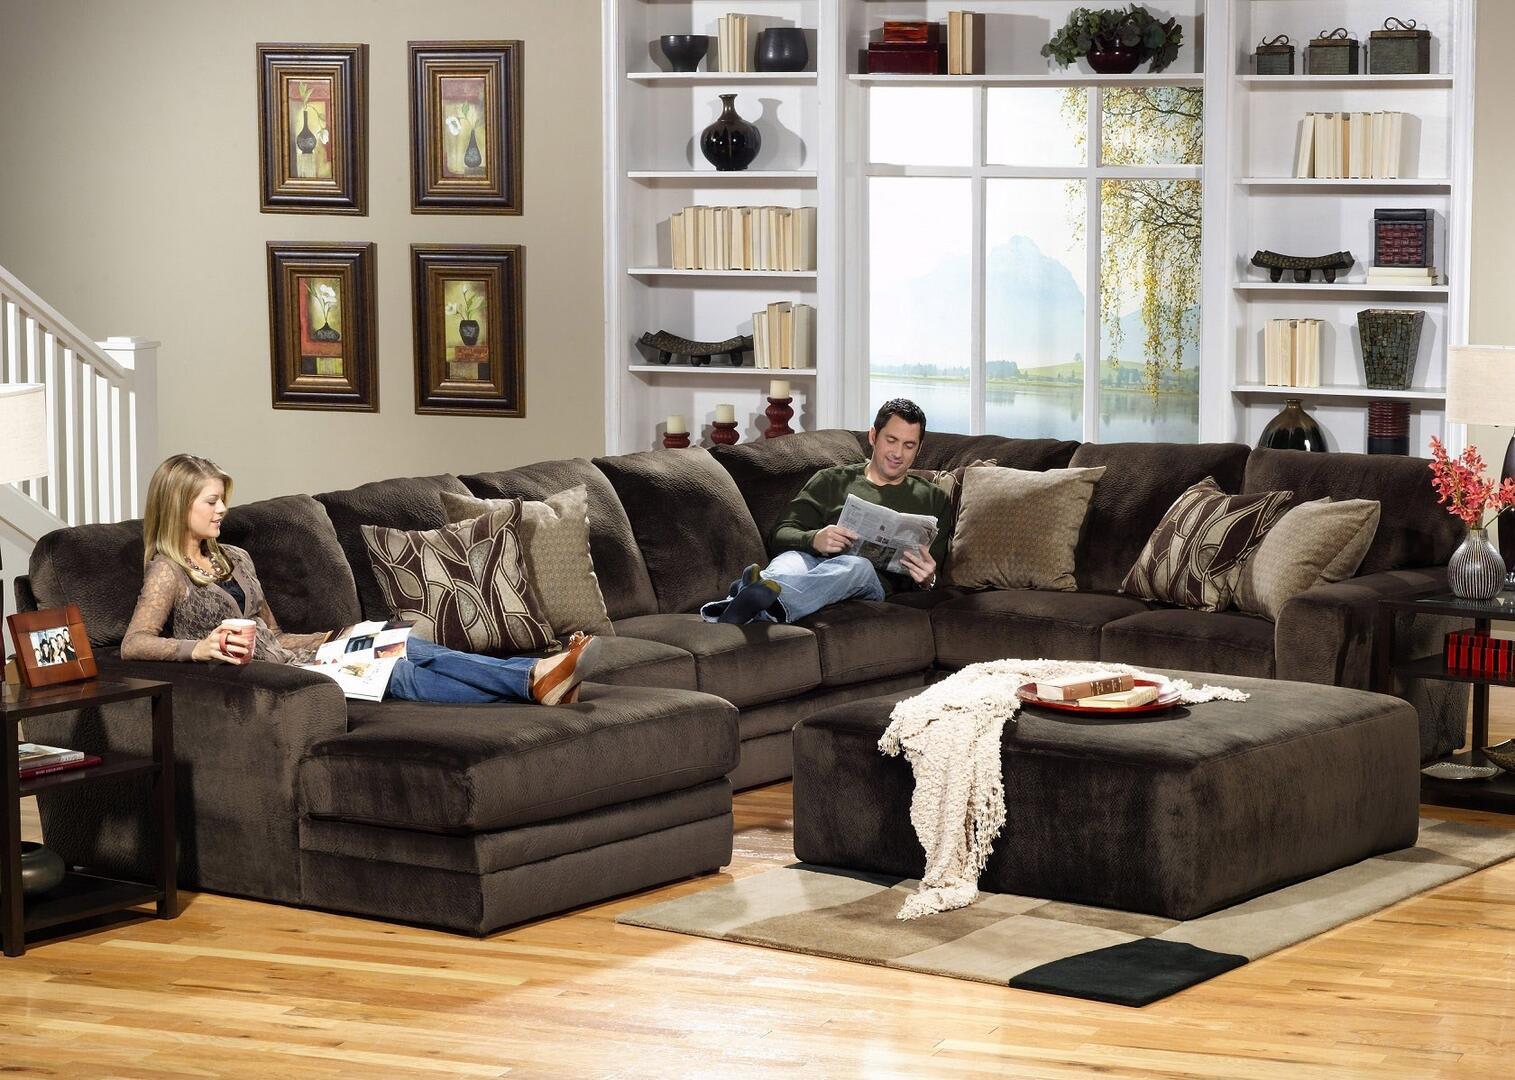 Jackson Furniture Everest Collection